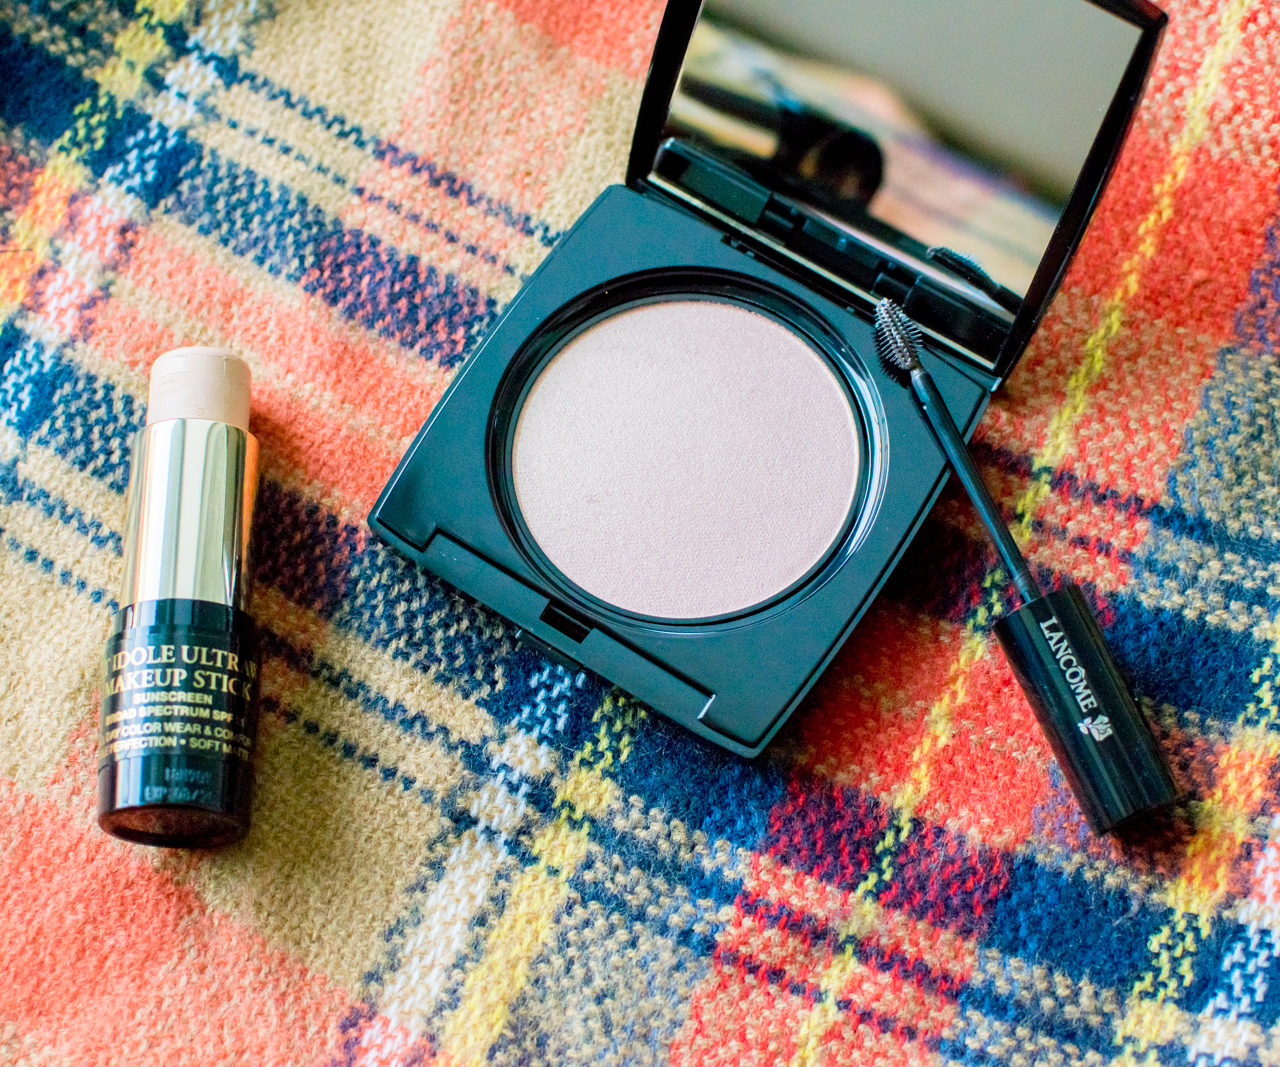 Beauty Finds – Lancome Dual Finish Highlighter, Teint Idole Ultra Makeup Stick, Sourcils Styler Brow Gel